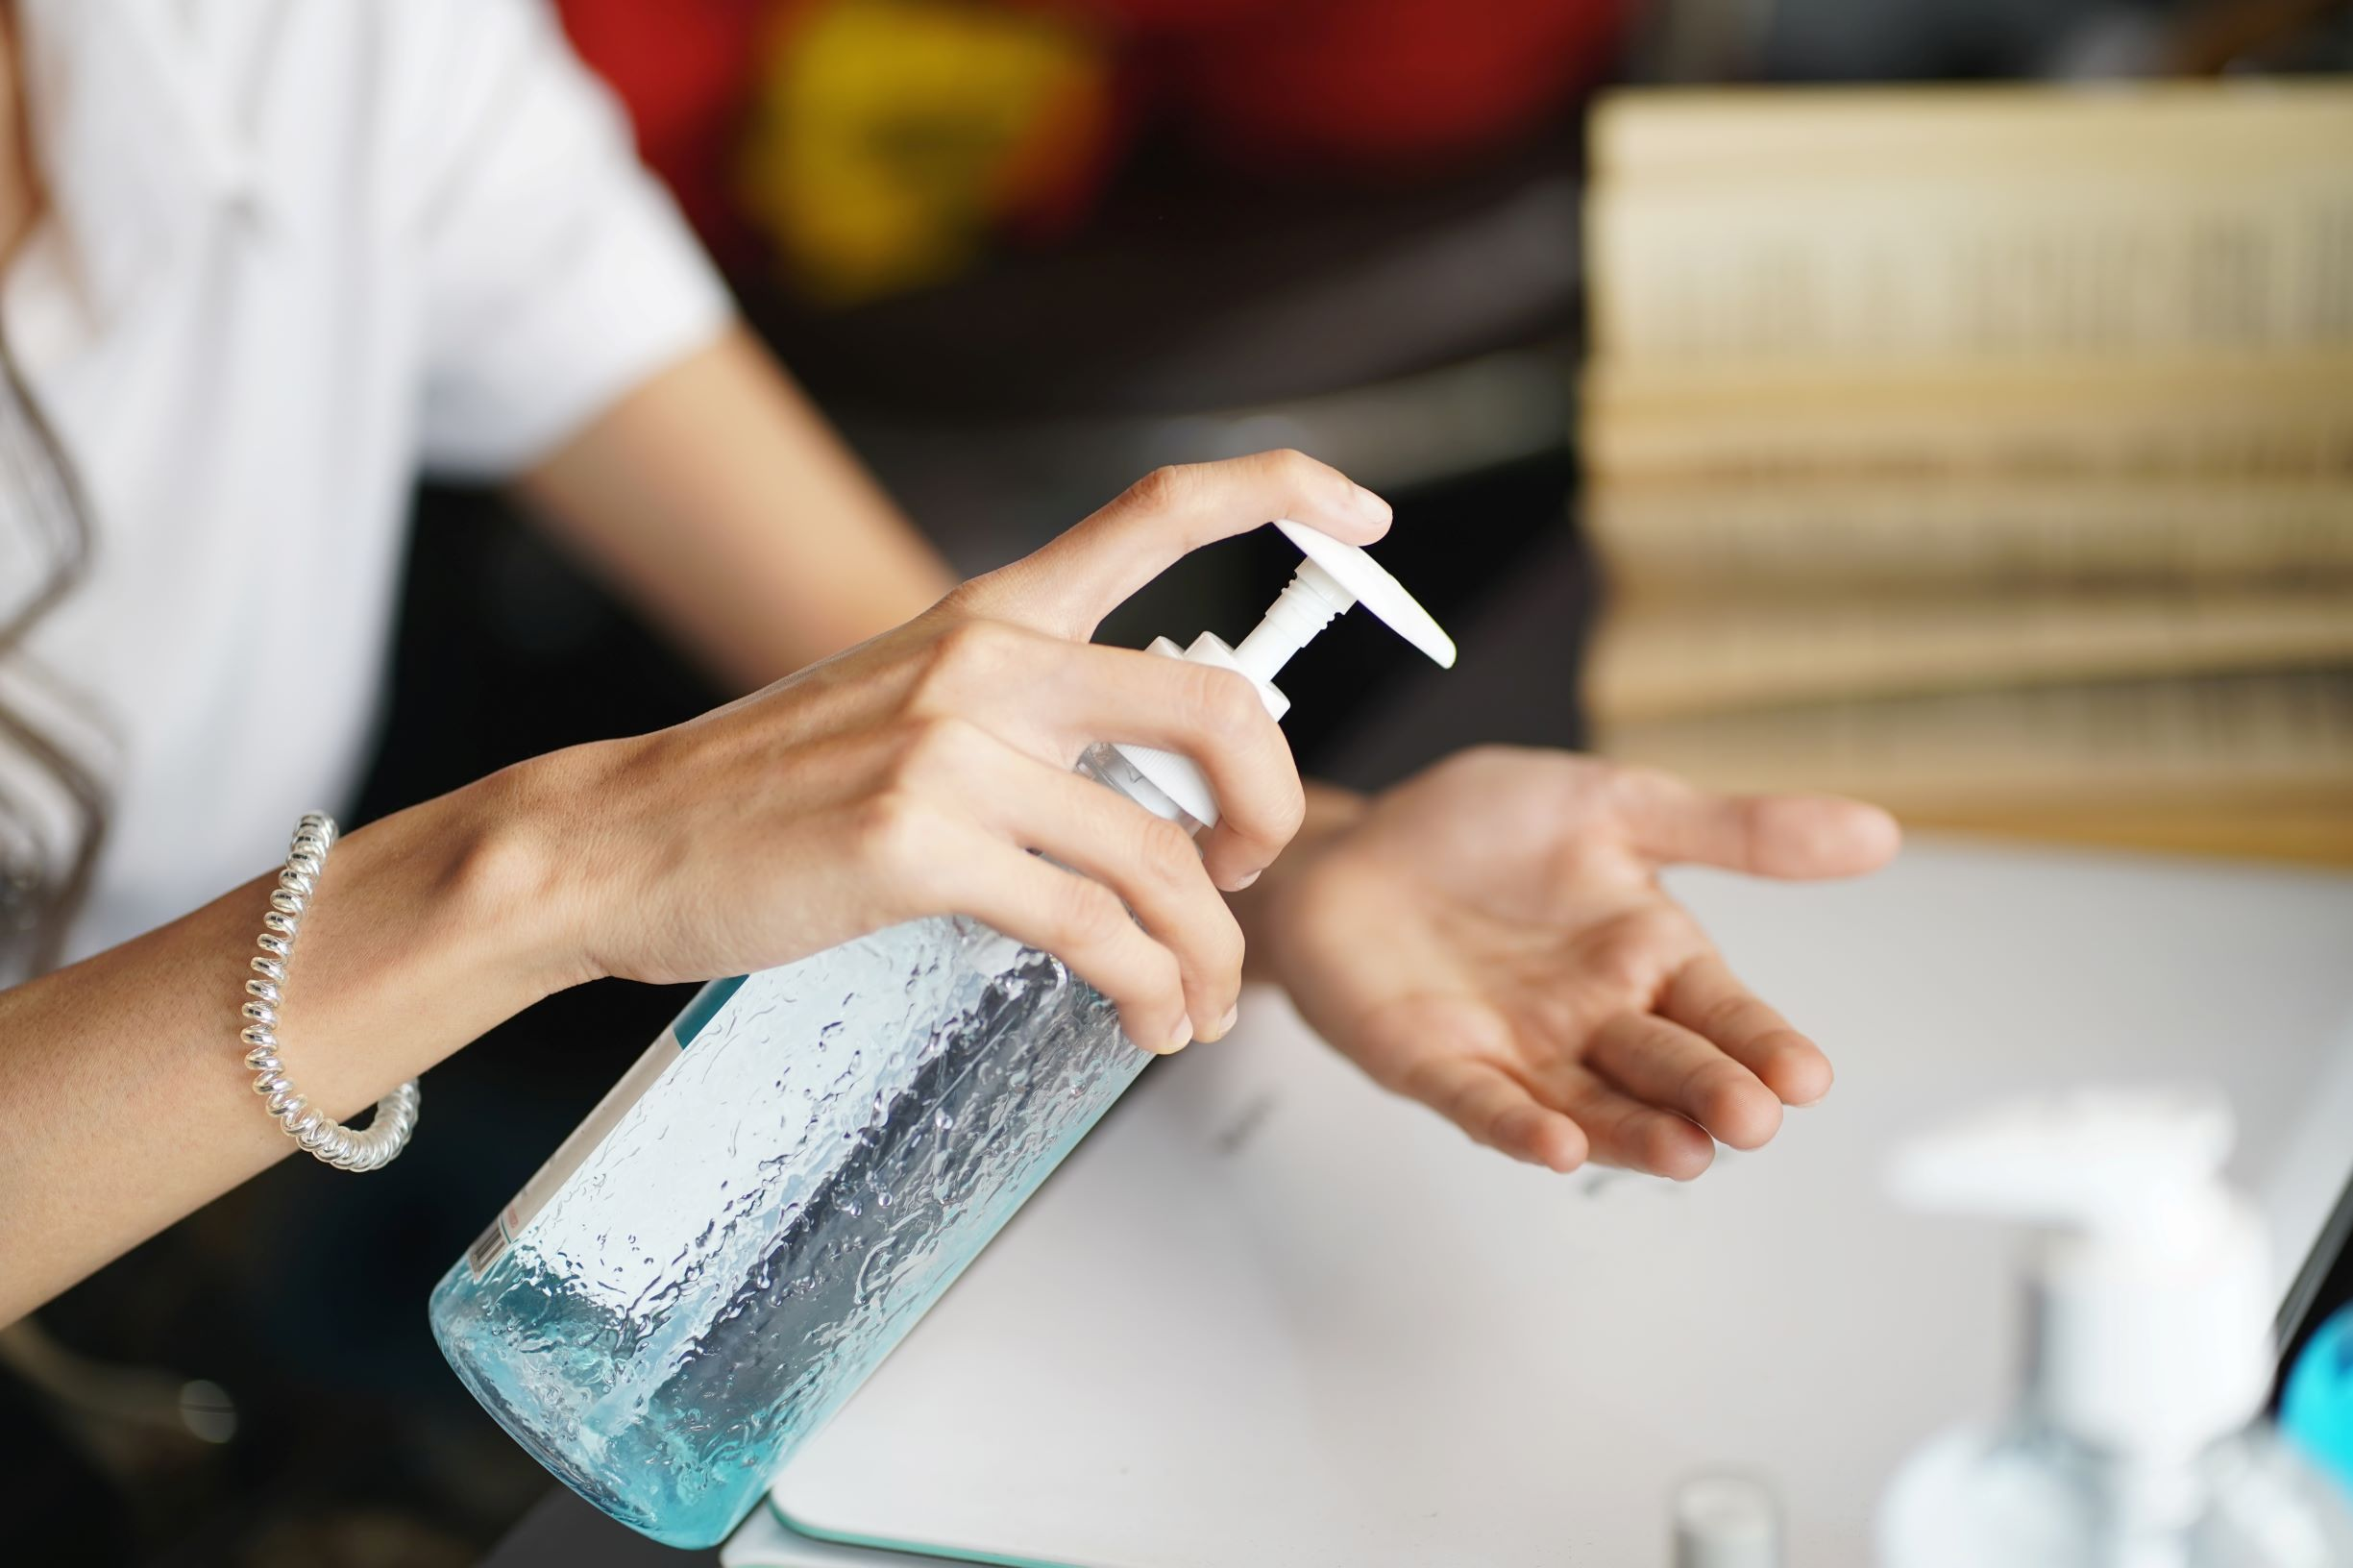 coronavirus covid-19 update updates sanitize disinfect sanitizer